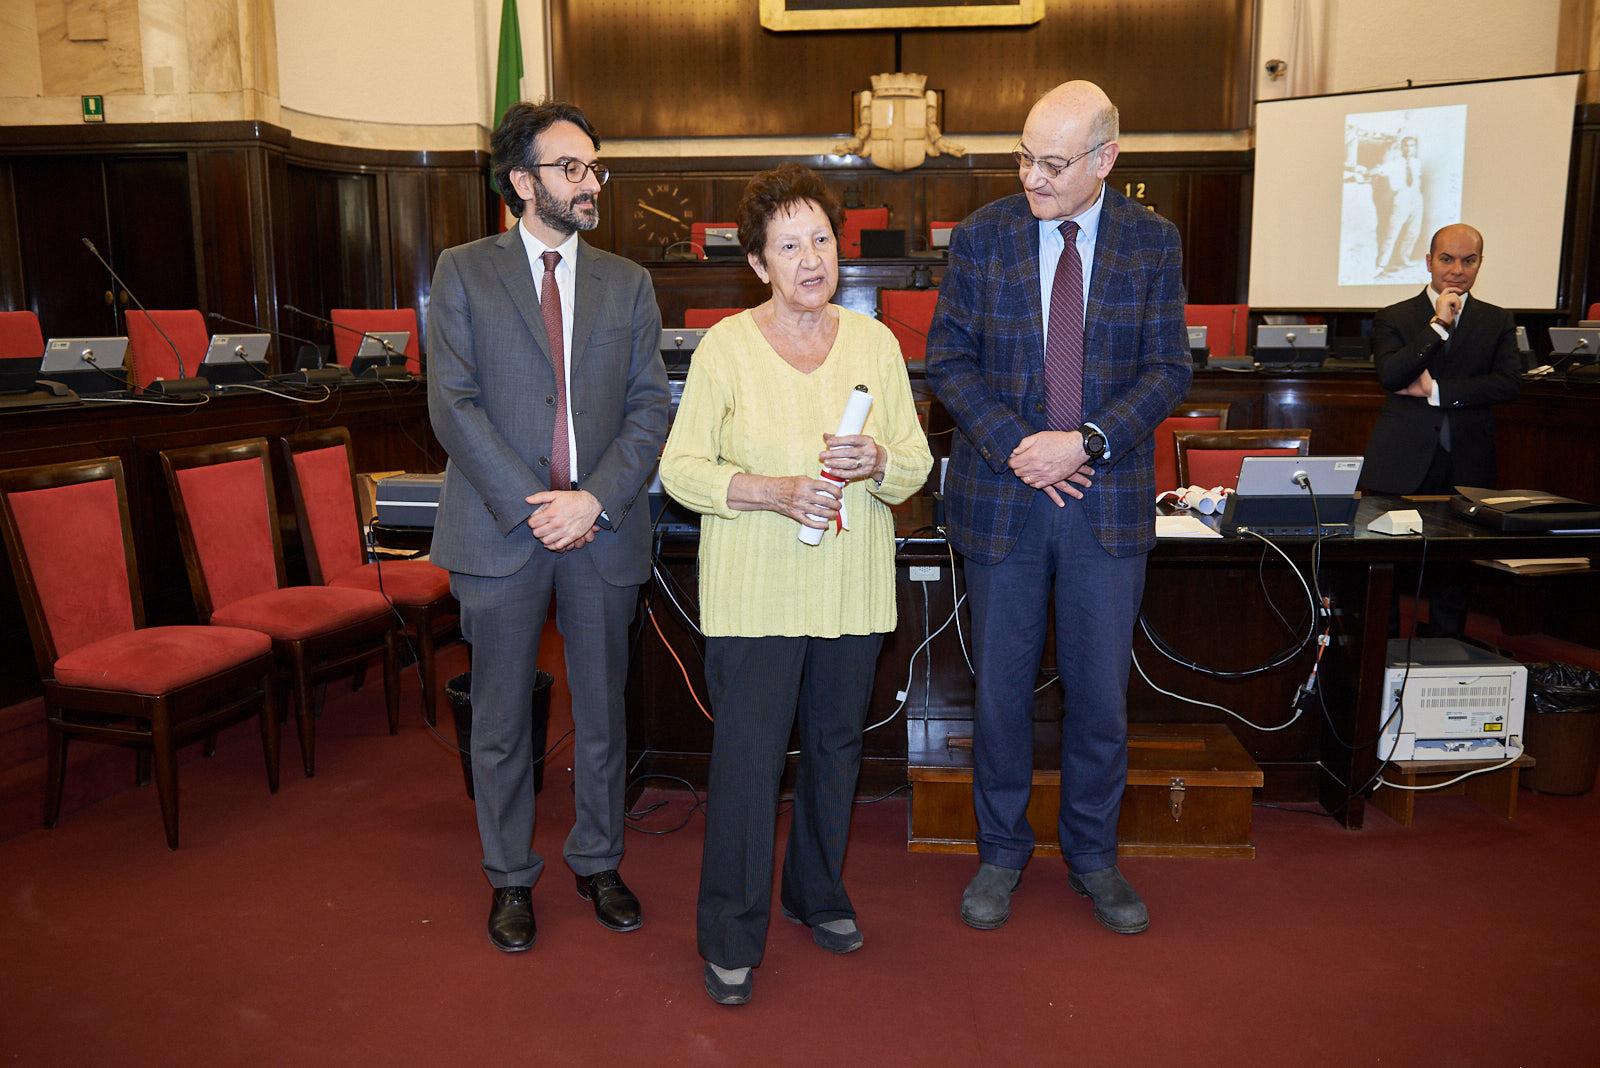 Marilena Dossena  picks up the parchment for Corrado Bonfantini